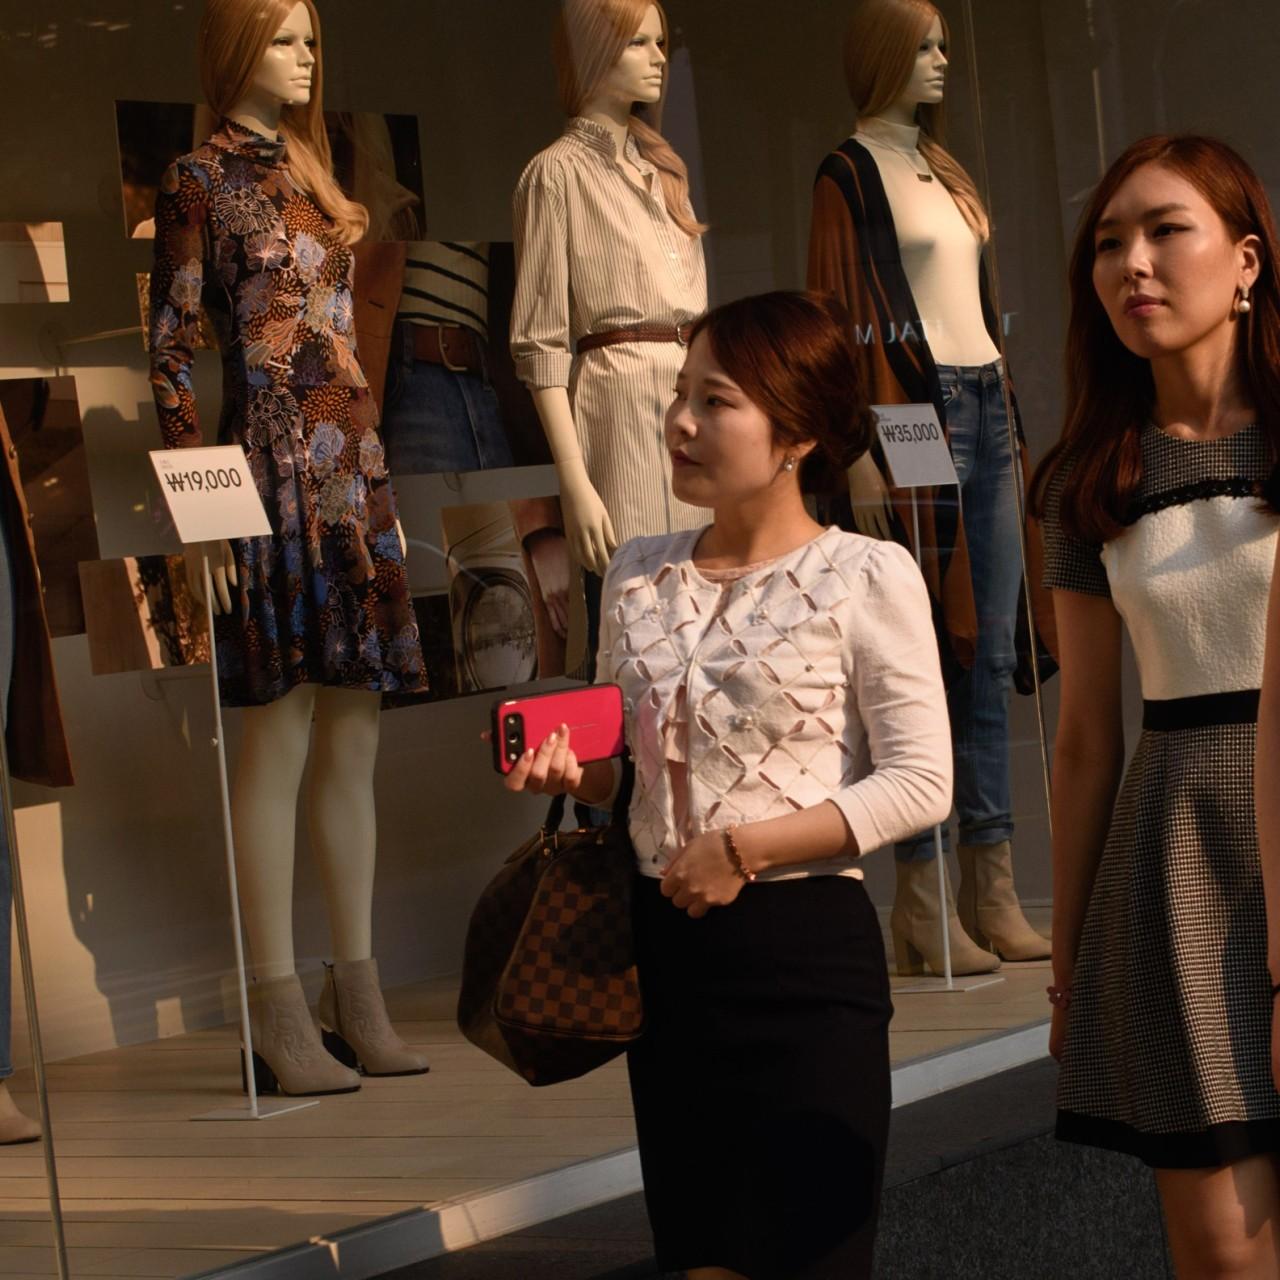 037794a2d When the dream dies: female North Korean defectors suffer prejudice ...